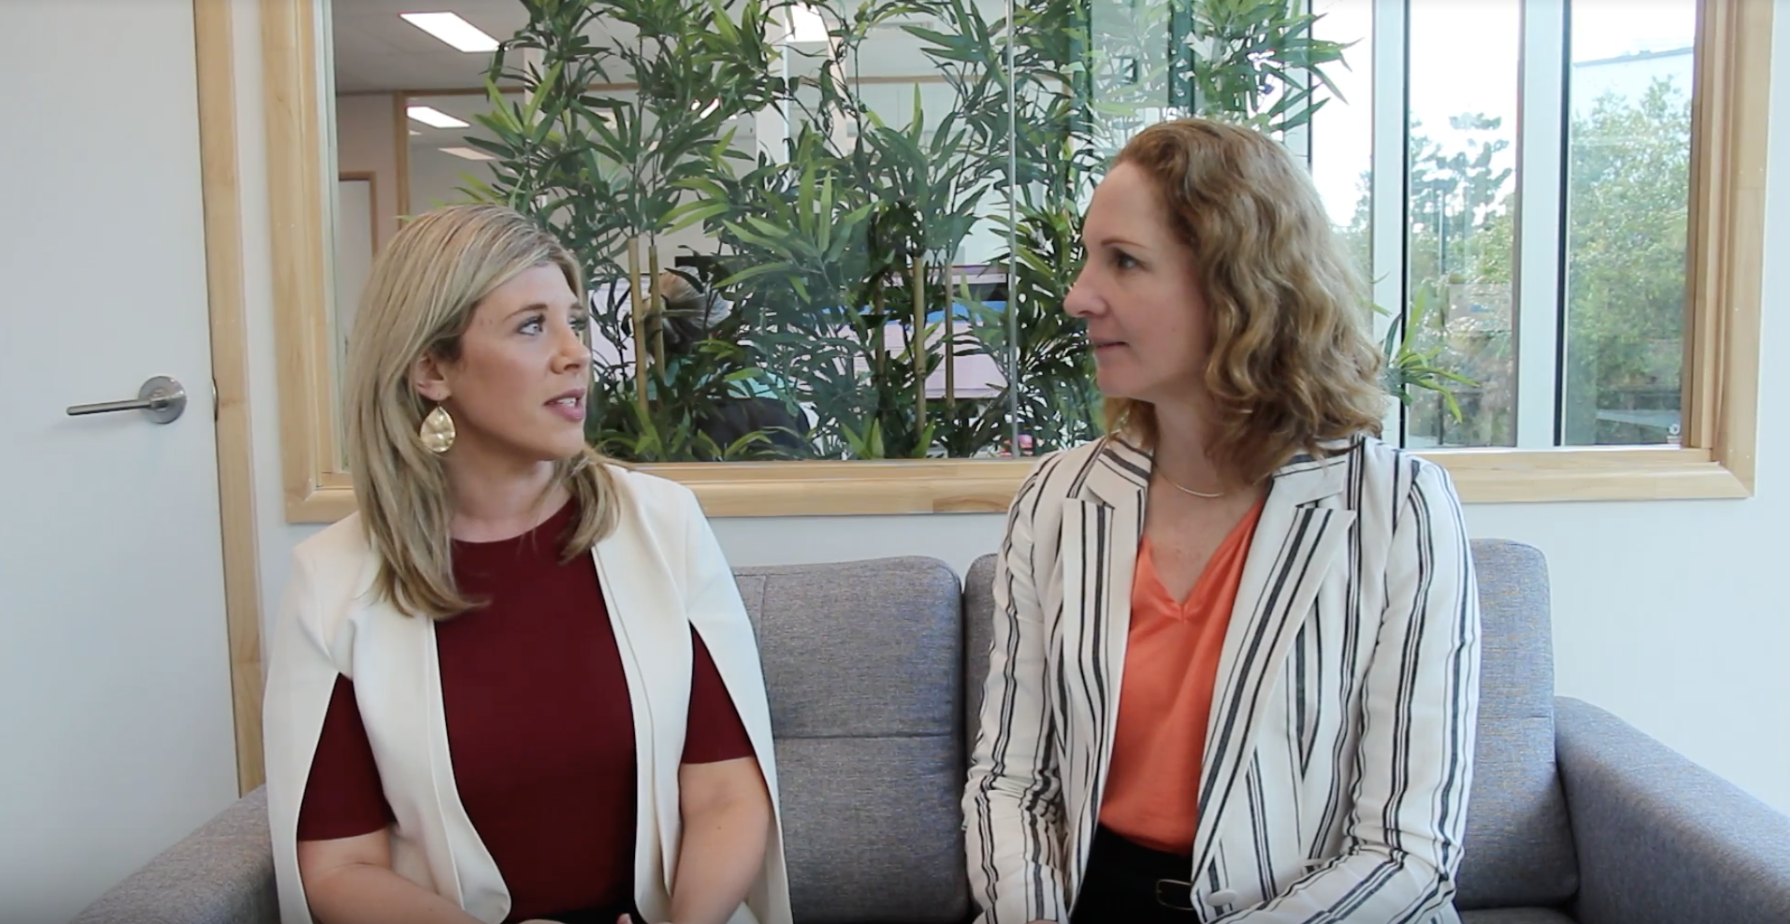 Ellie Bakker and Jeanette Jifkins Discuss Healthcare Specialisation